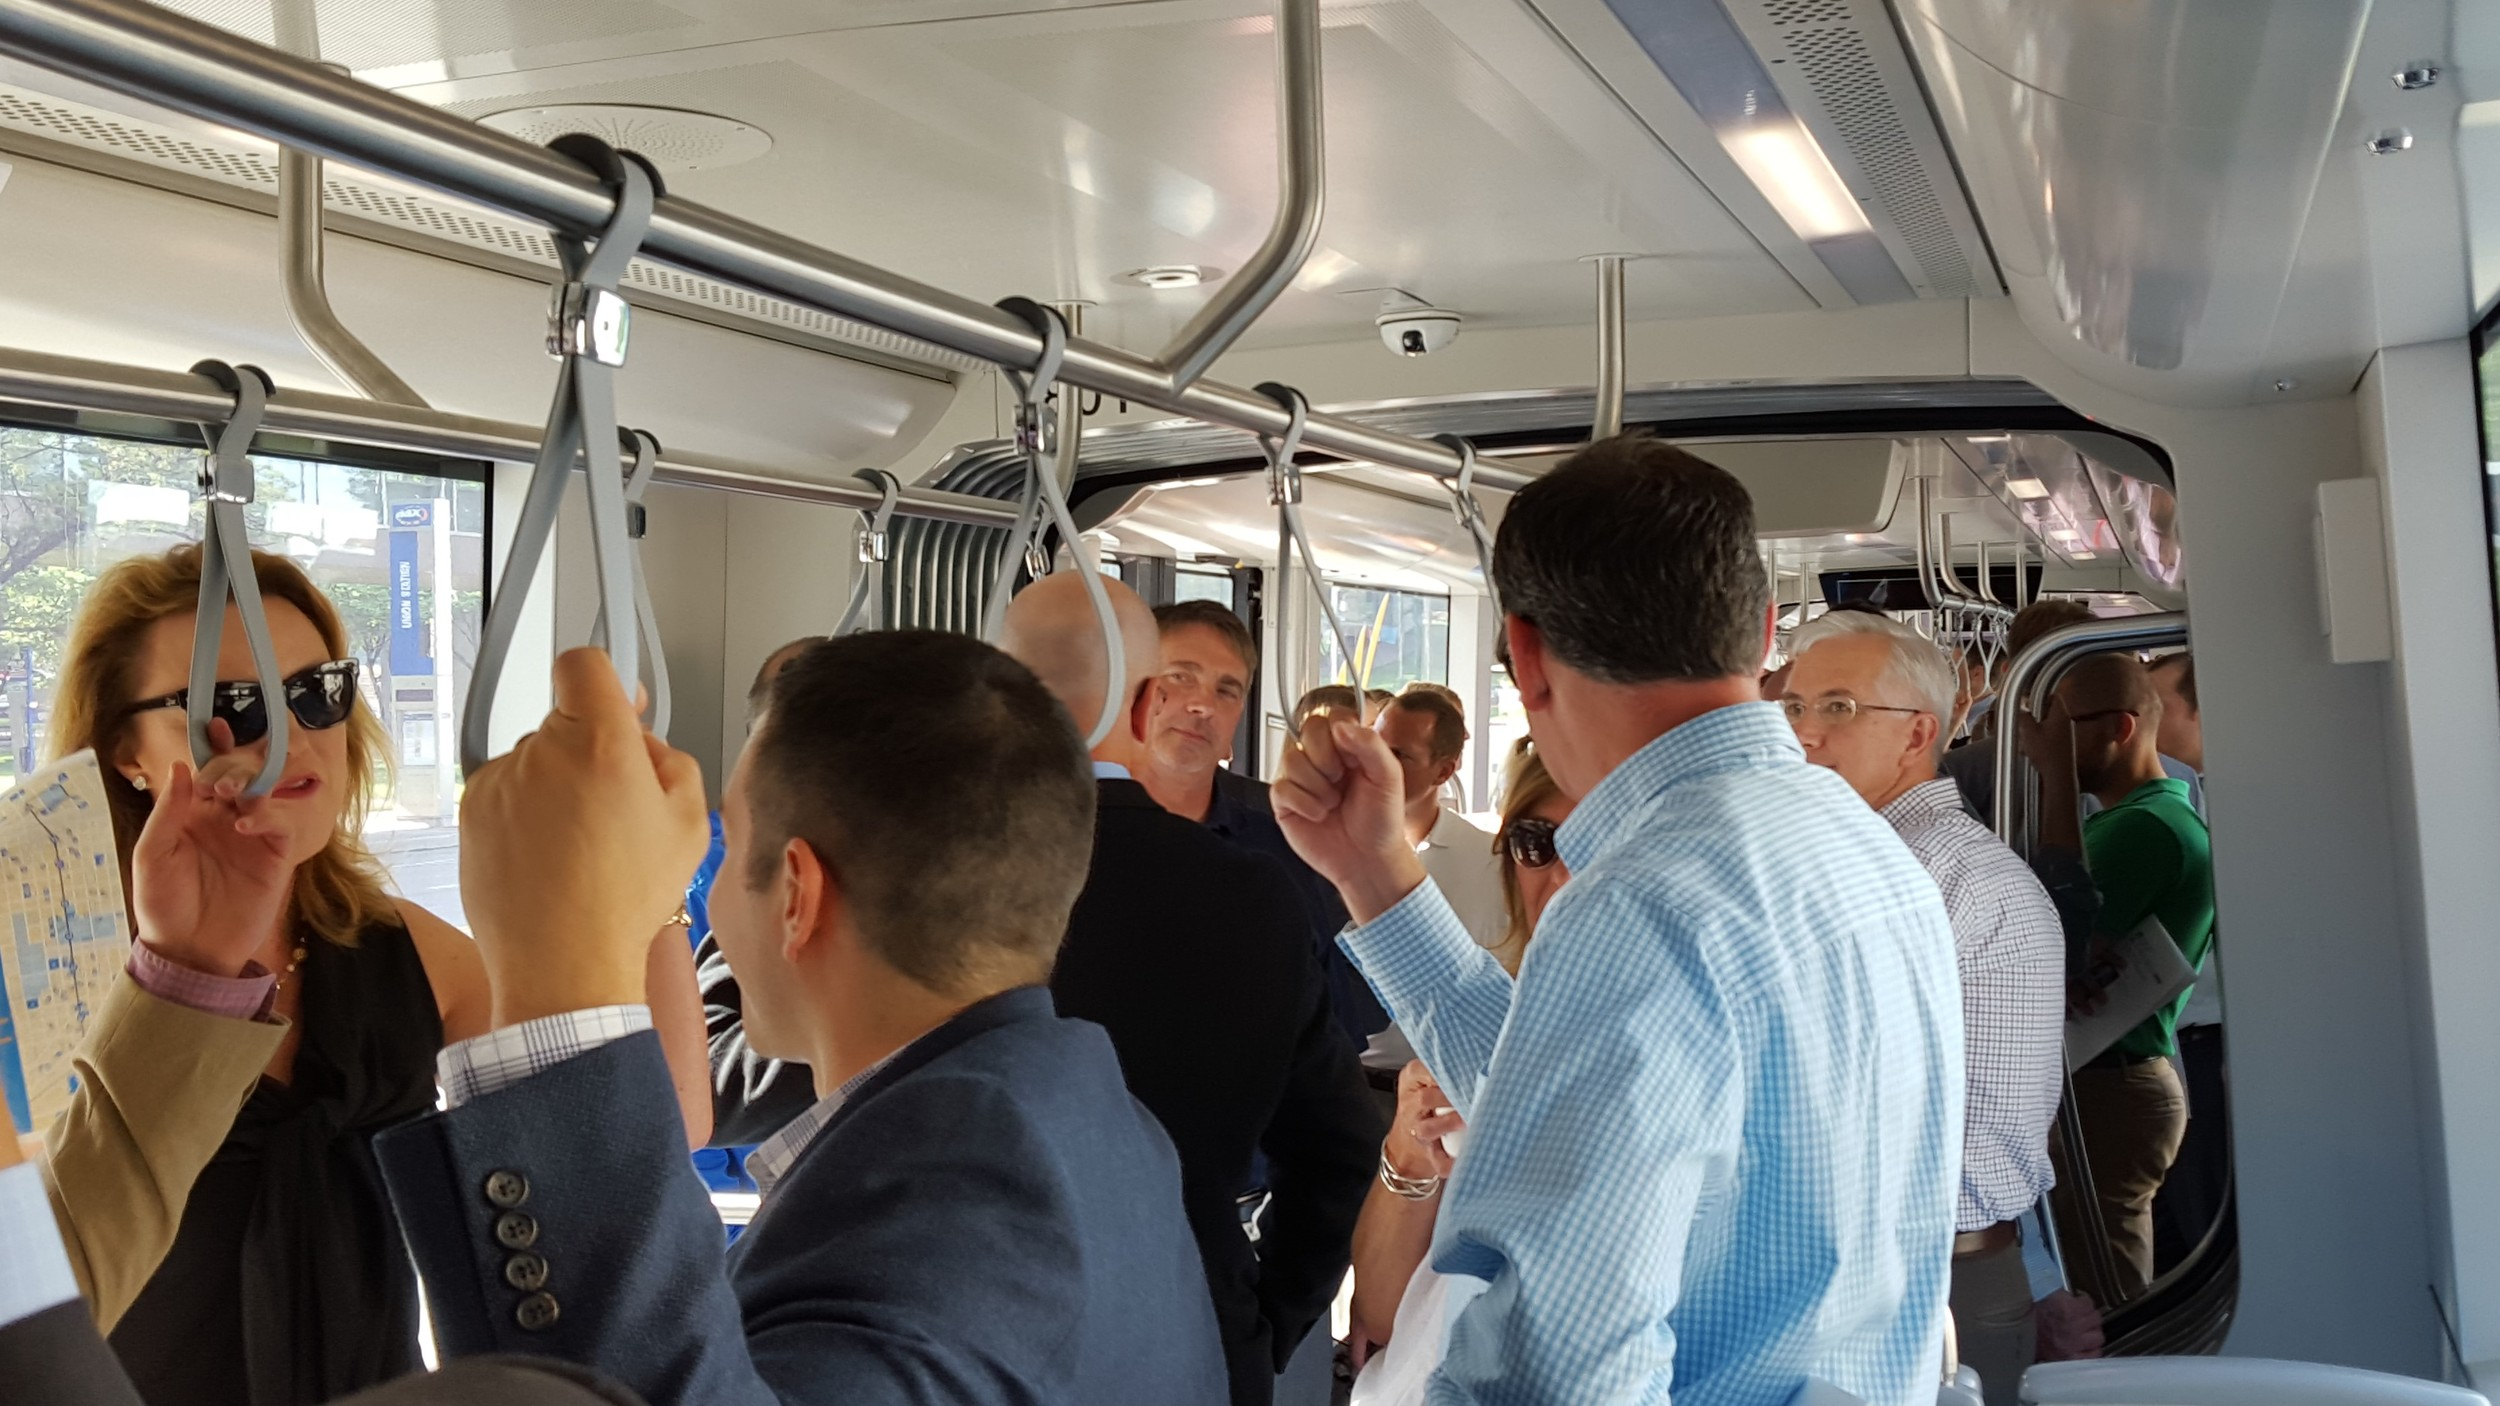 Members of ULI Kansas City shop for development opportunities along the streetcar line.